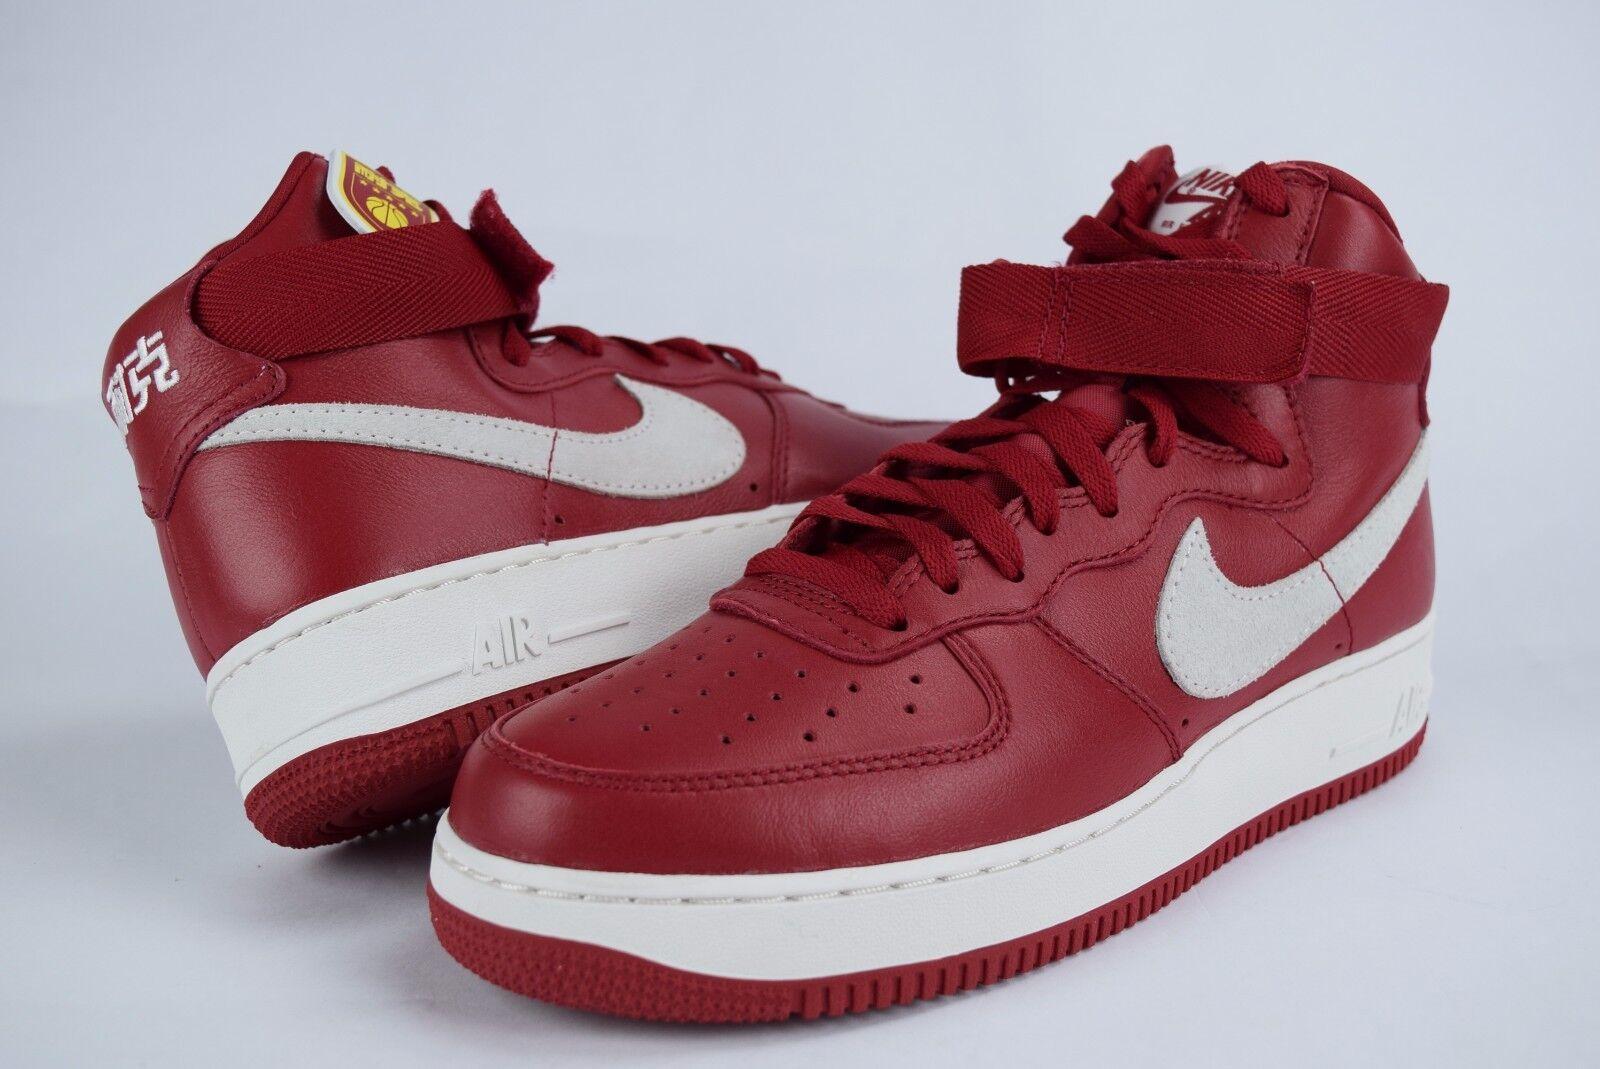 Nike Air Force 1 HI Retro QS sz 9-10 743546 600 NAI KE China red supreme white x